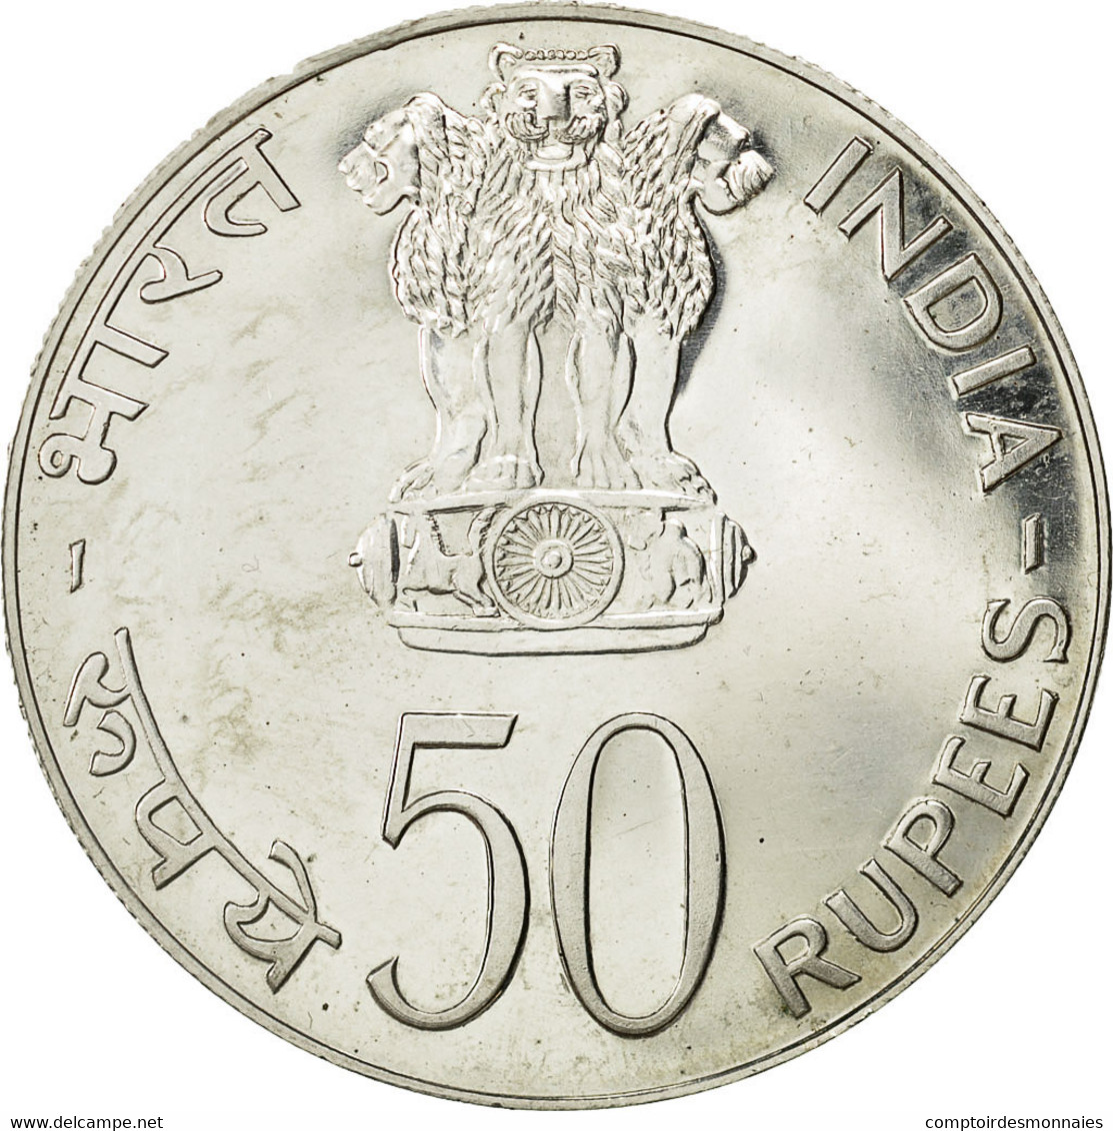 INDIA-REPUBLIC, 50 Rupees, 1974, Mumbai, Bombay, SUP, Argent, KM:255 - India